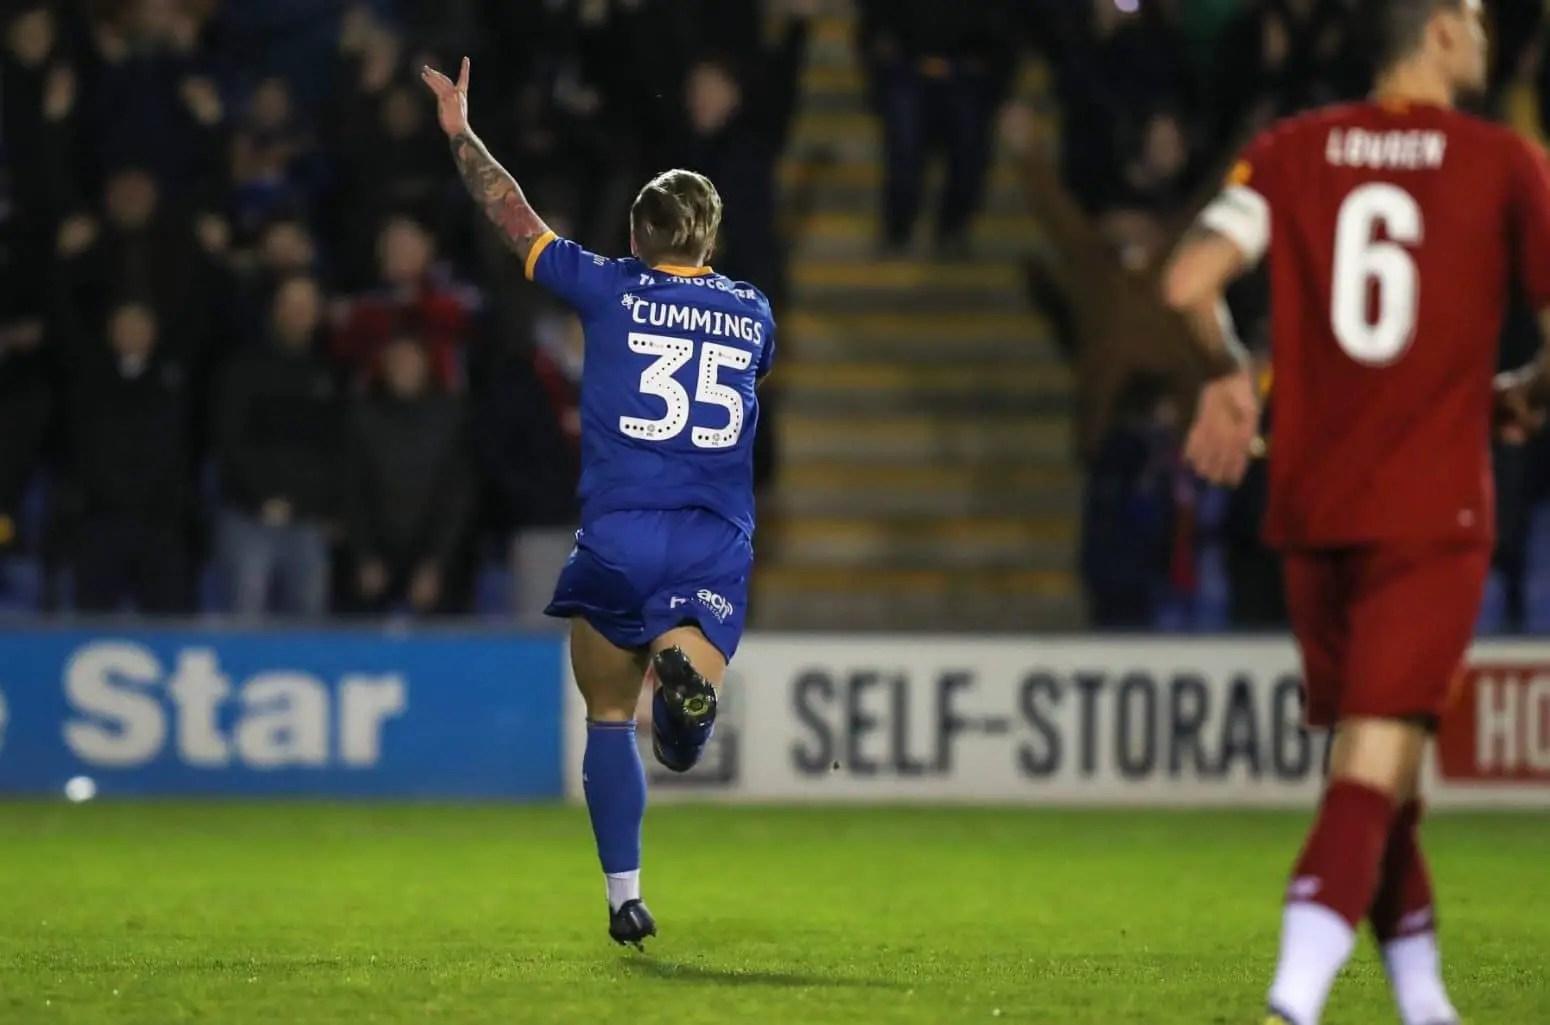 Shrewsbury 2-2 Liverpool – Highlights and Goals (Video)